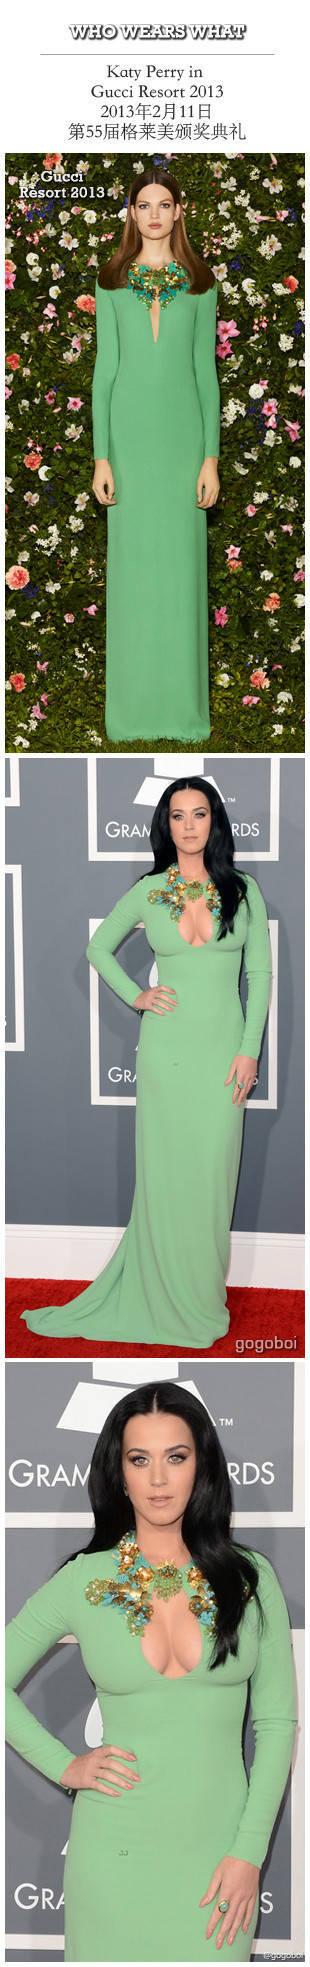 Katy Perry穿Gucci 2013度假定制系列绿色长裙,亮相第55届格莱美颁奖典礼。裙子原本是一片郁郁葱葱宁静祥和的青草地,到了Katy PerryPerry身上,就被她那两枚重型炸弹给炸开了花。看到Katy我终于明白,原来小清新和重口味之间就隔着一道深深的乳沟。 via @gogoboi